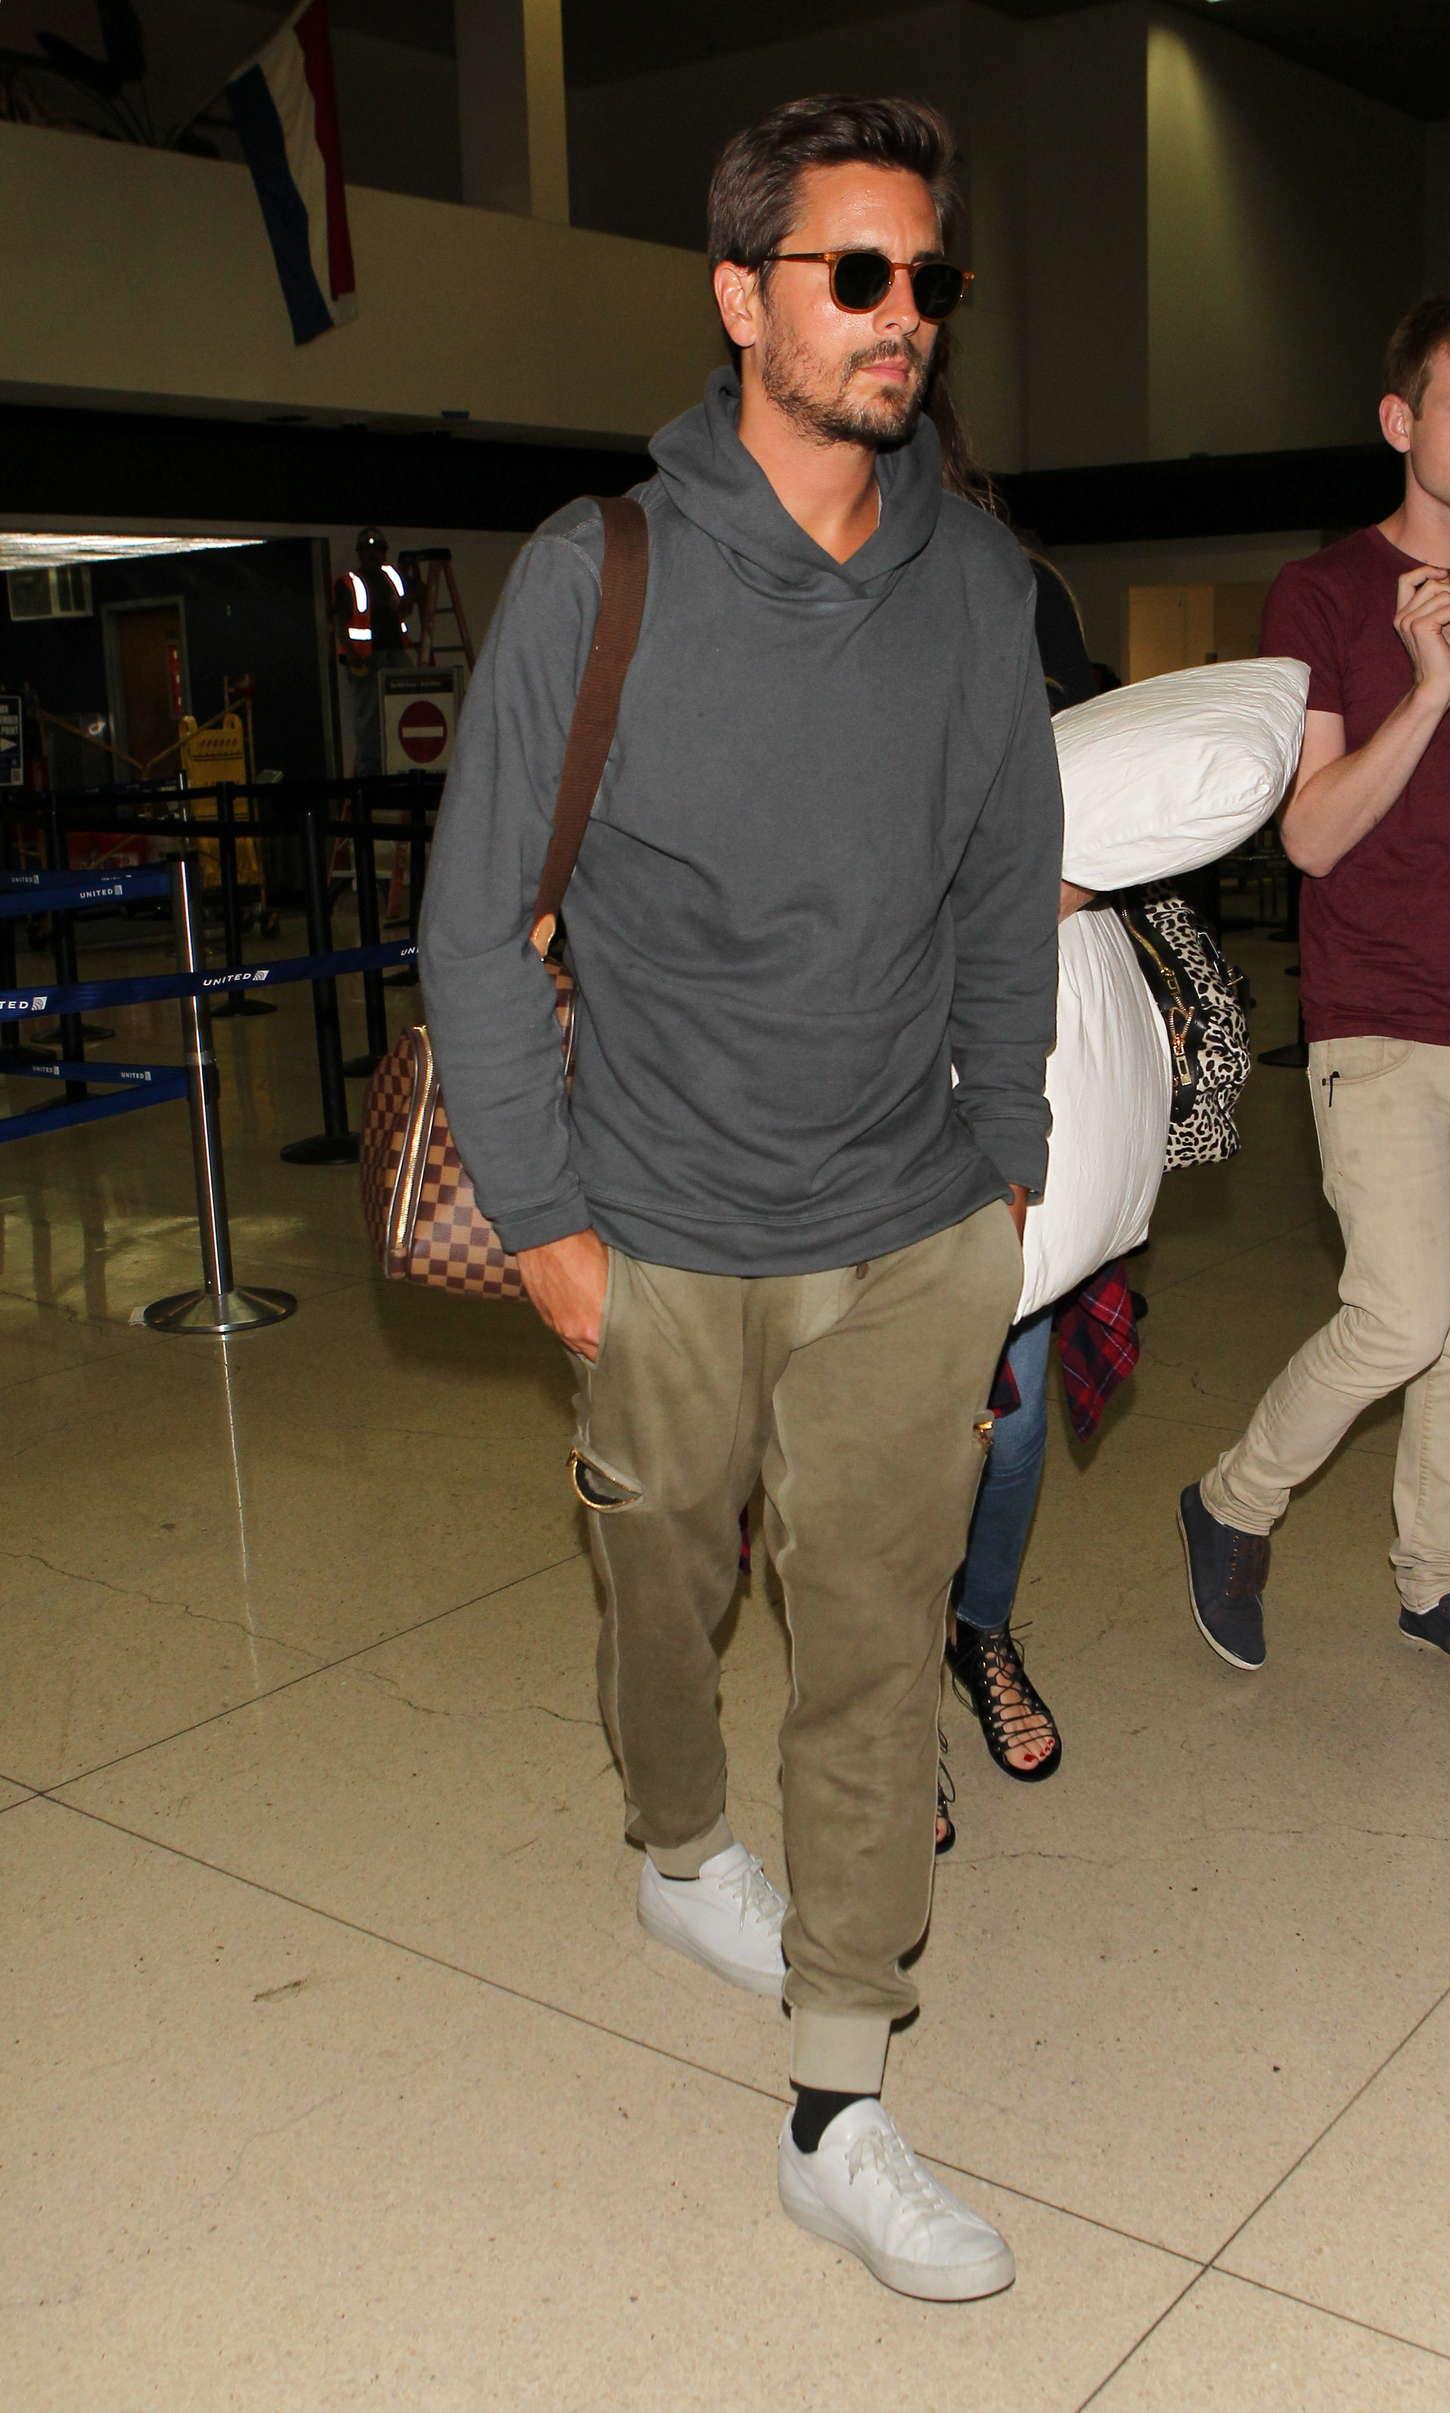 Khloe Kardashian 2014 : Khloe Kardashian with Scott Disick at LAX airport -07